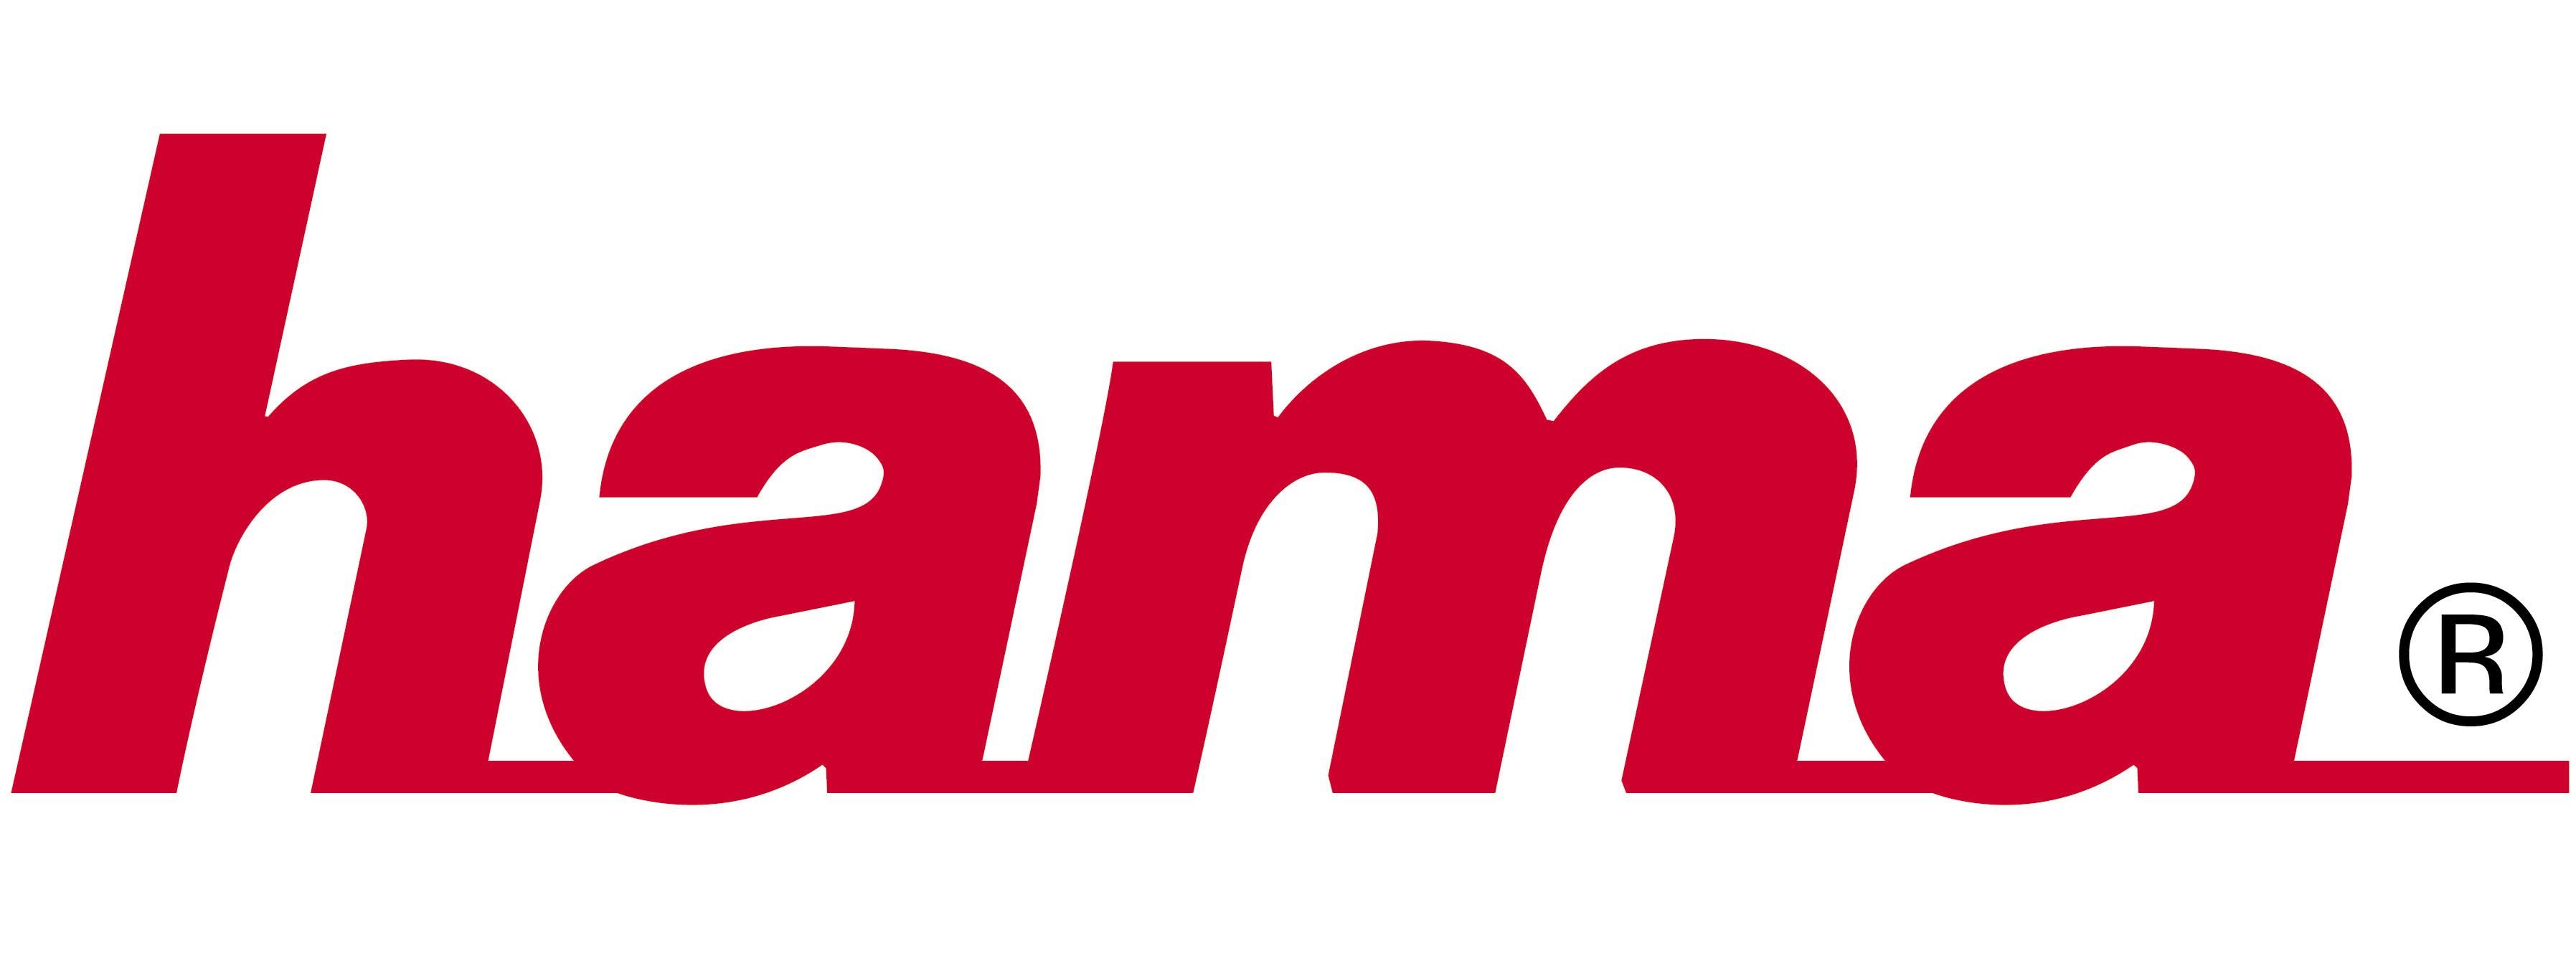 Hama logo wallpapers HD